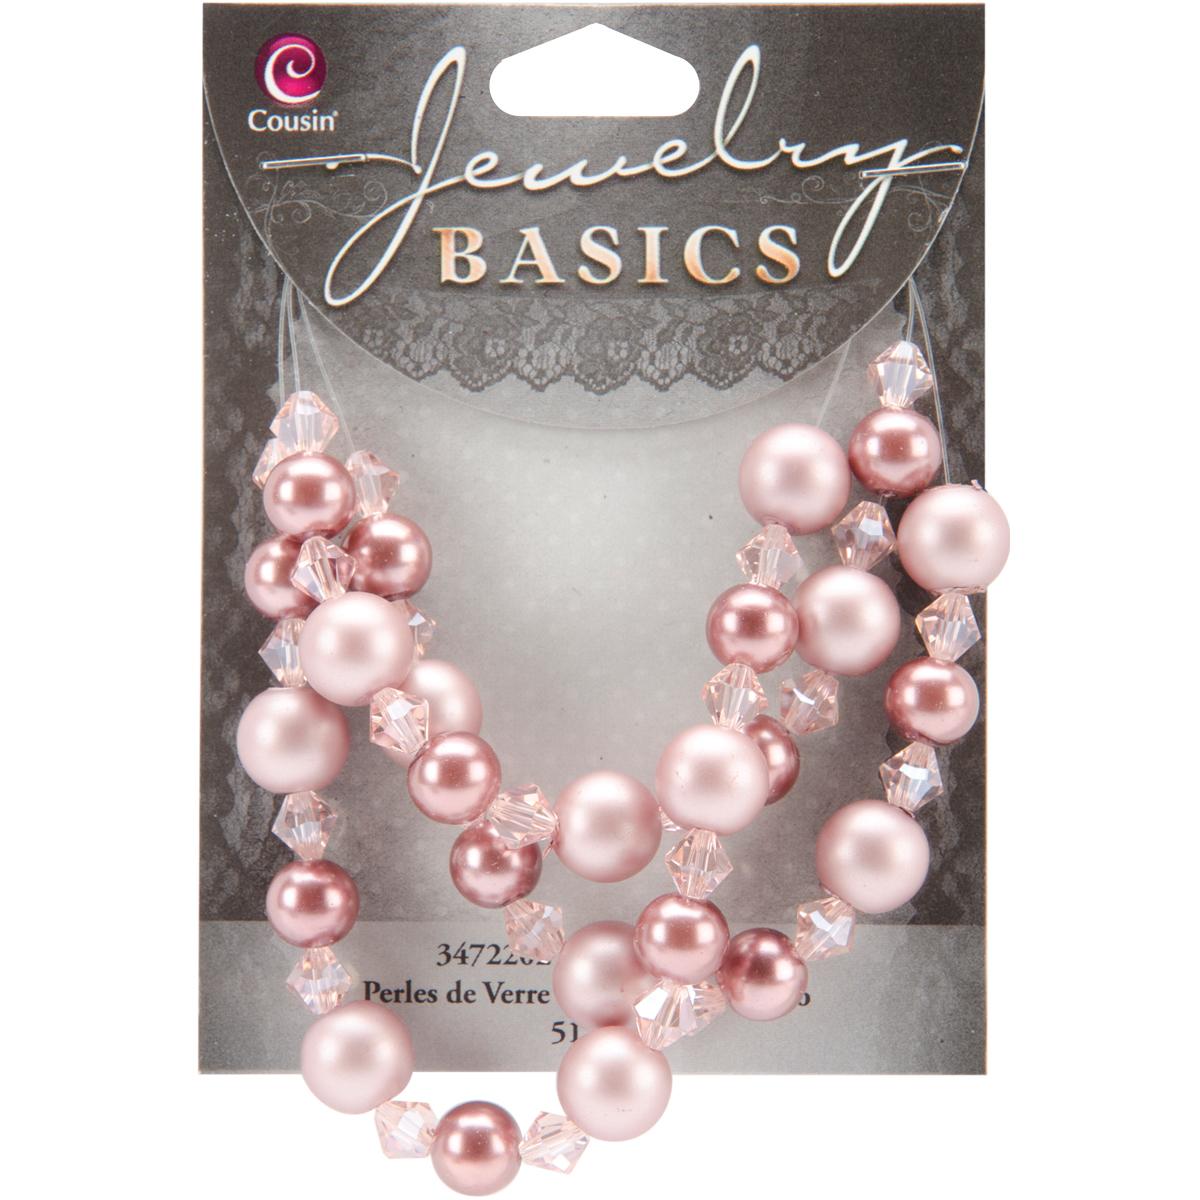 Cousin Jewelry Basics Glass Beads 51pc 8/10mm